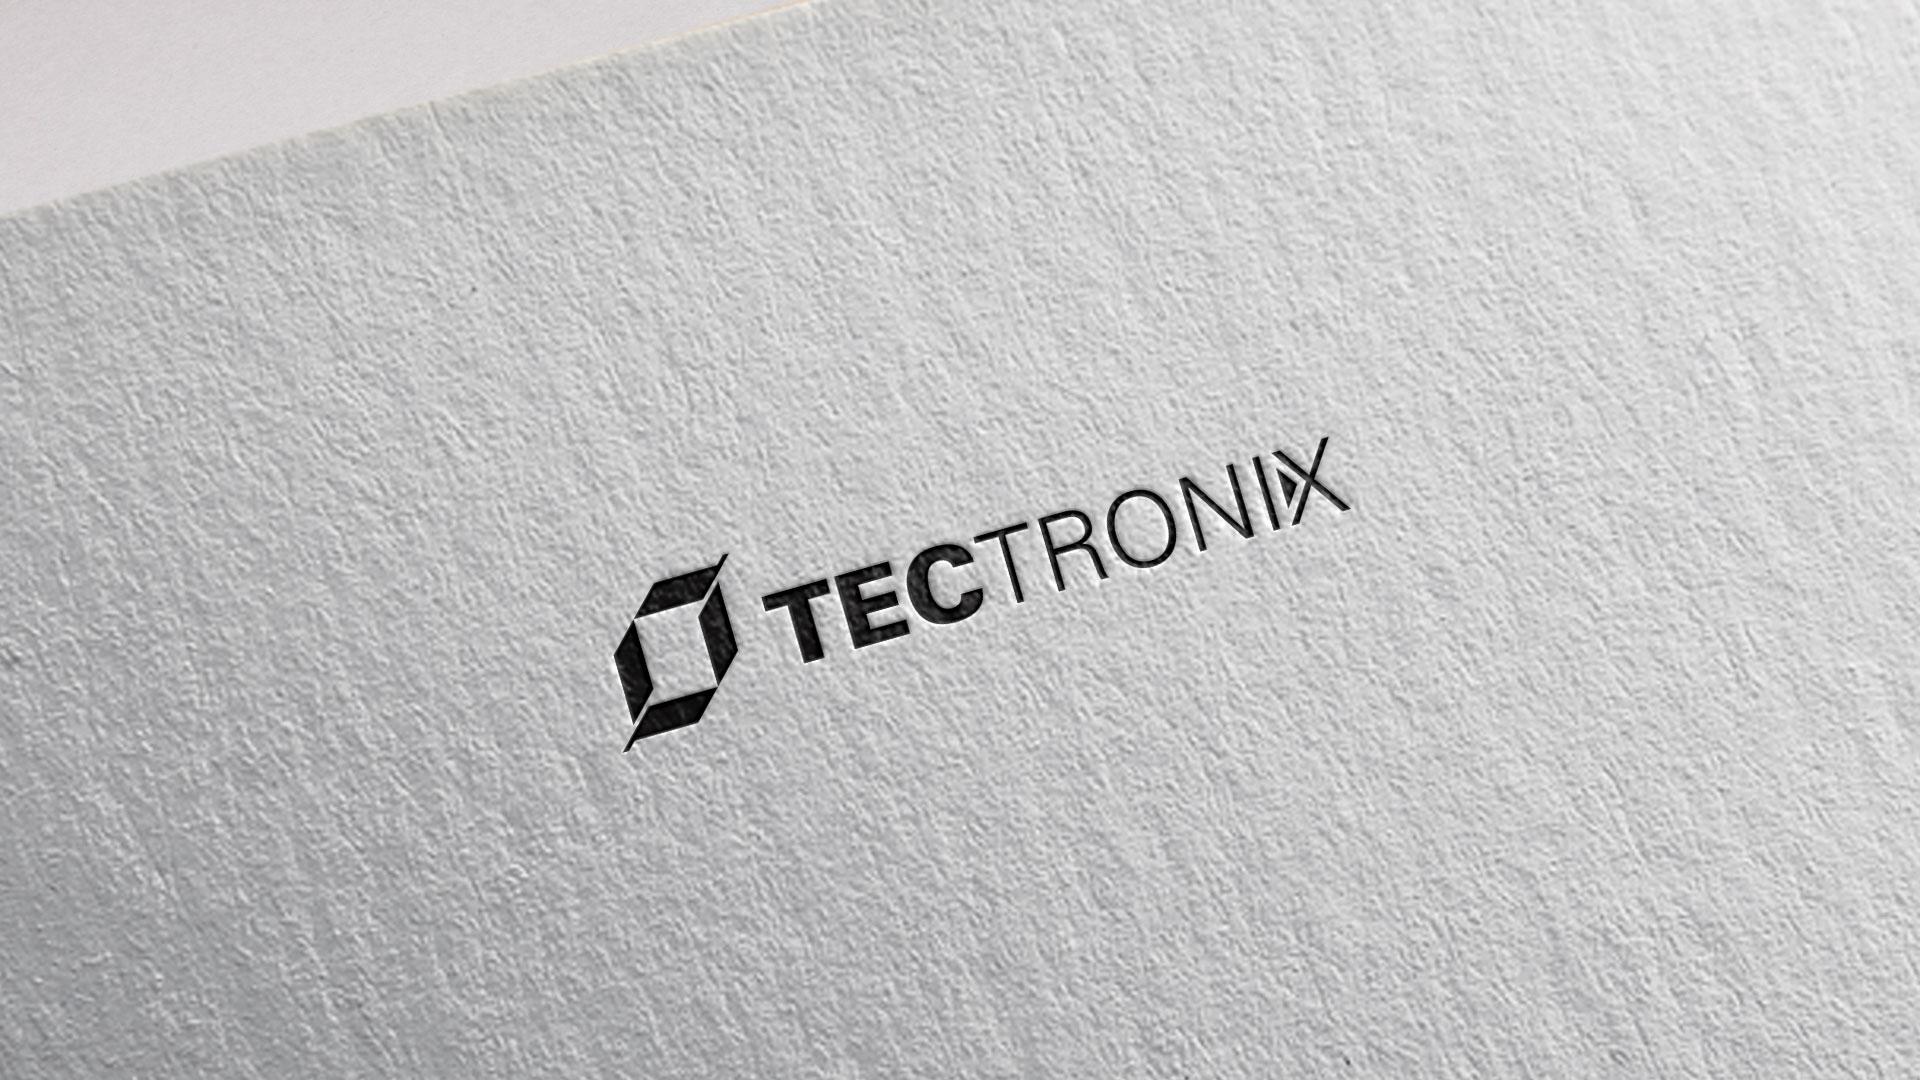 Identidad-corporativa-tectronix-logo-impreso